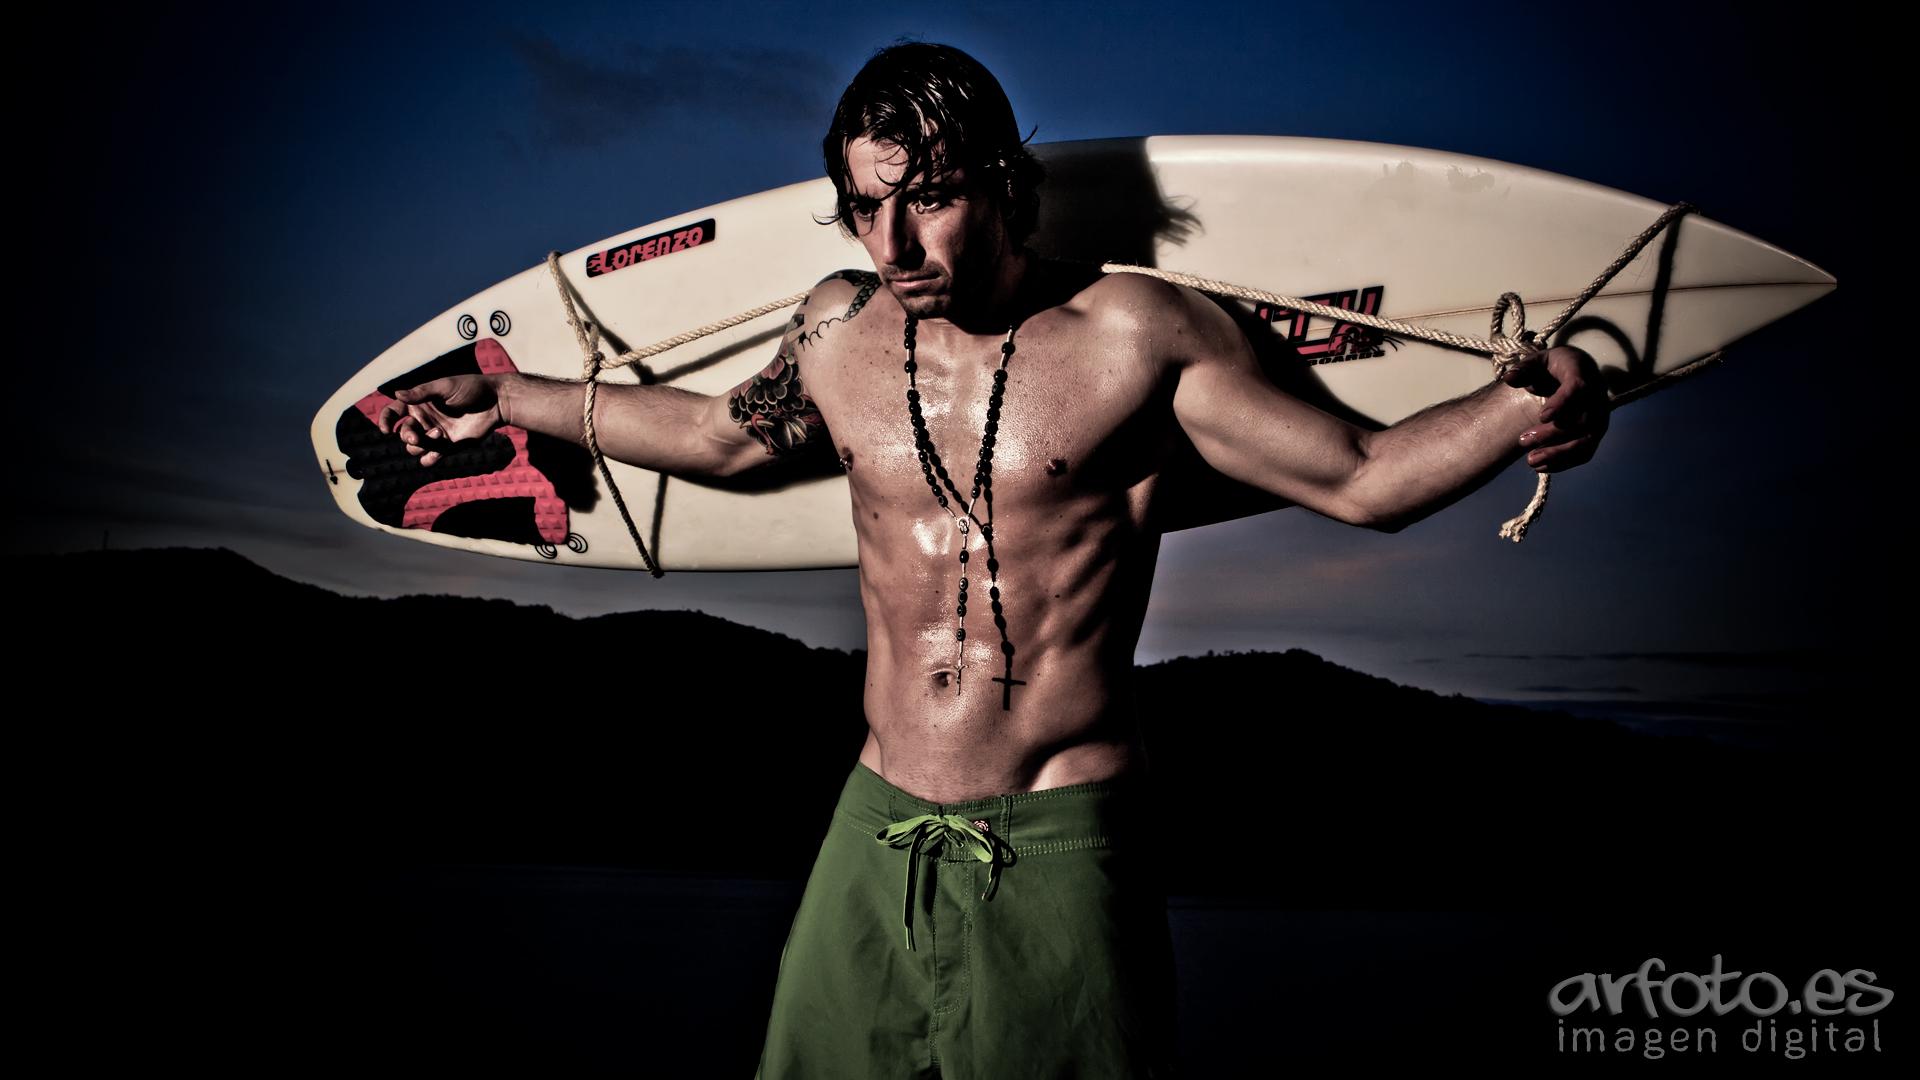 Atado al surf...